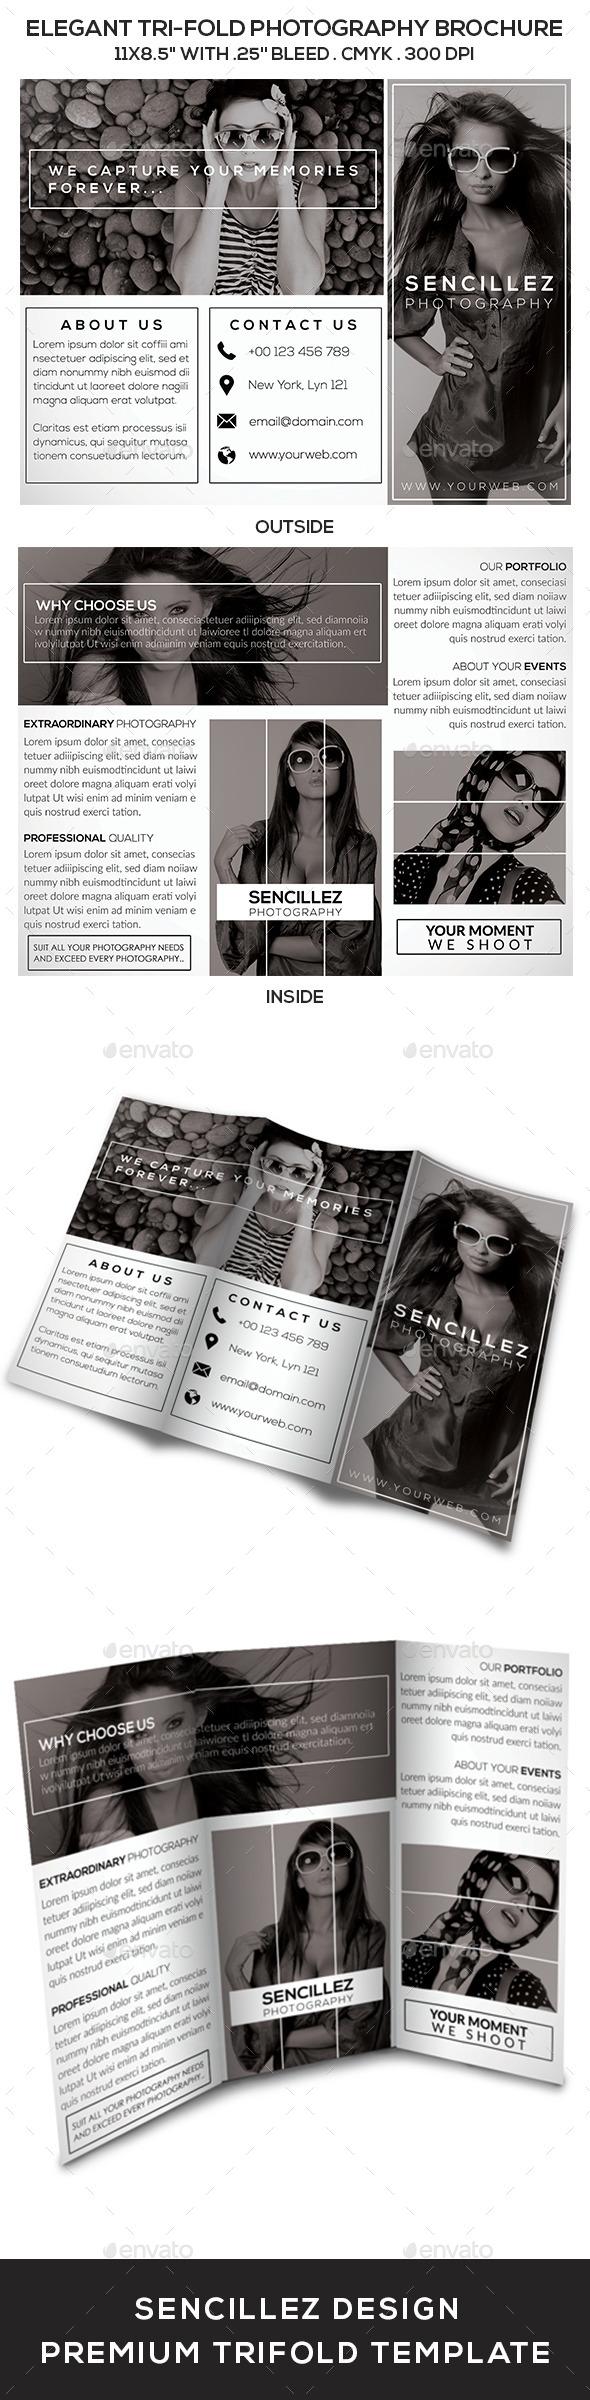 Elegant Tri-Fold Photography Brochure Vol. 2 - Corporate Brochures